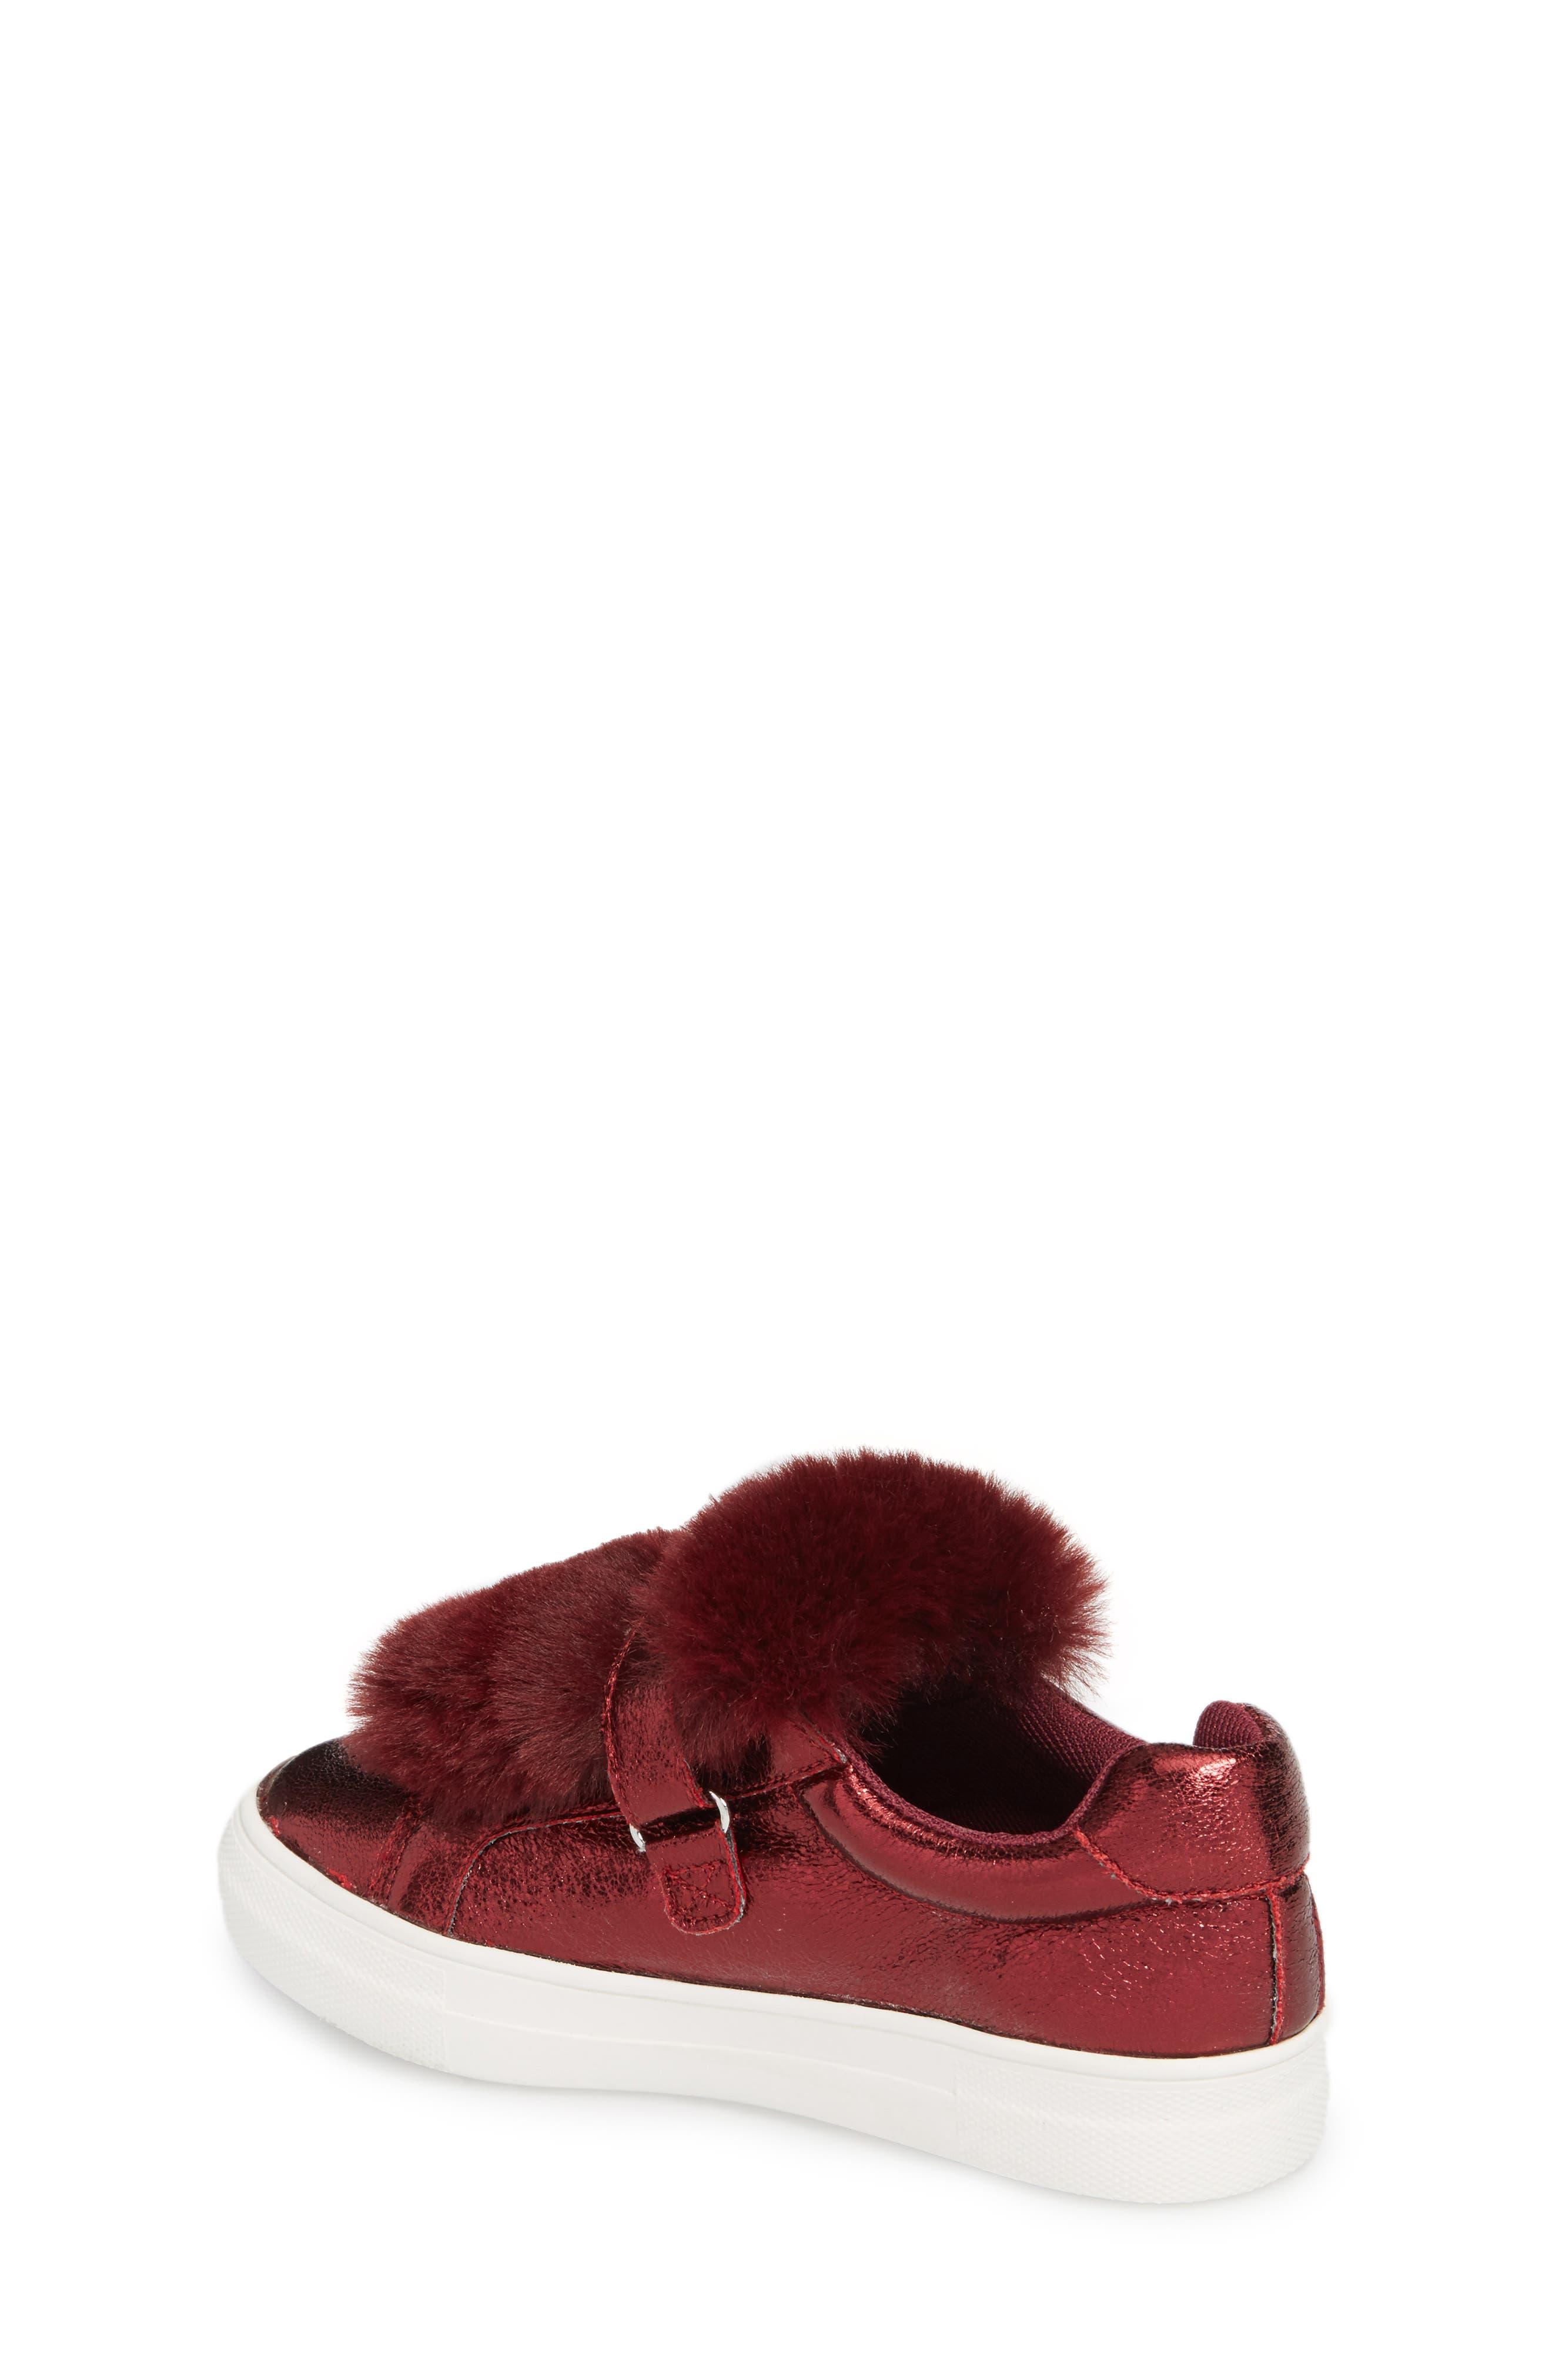 Zandra Faux Fur Metallic Sneaker,                             Alternate thumbnail 2, color,                             930